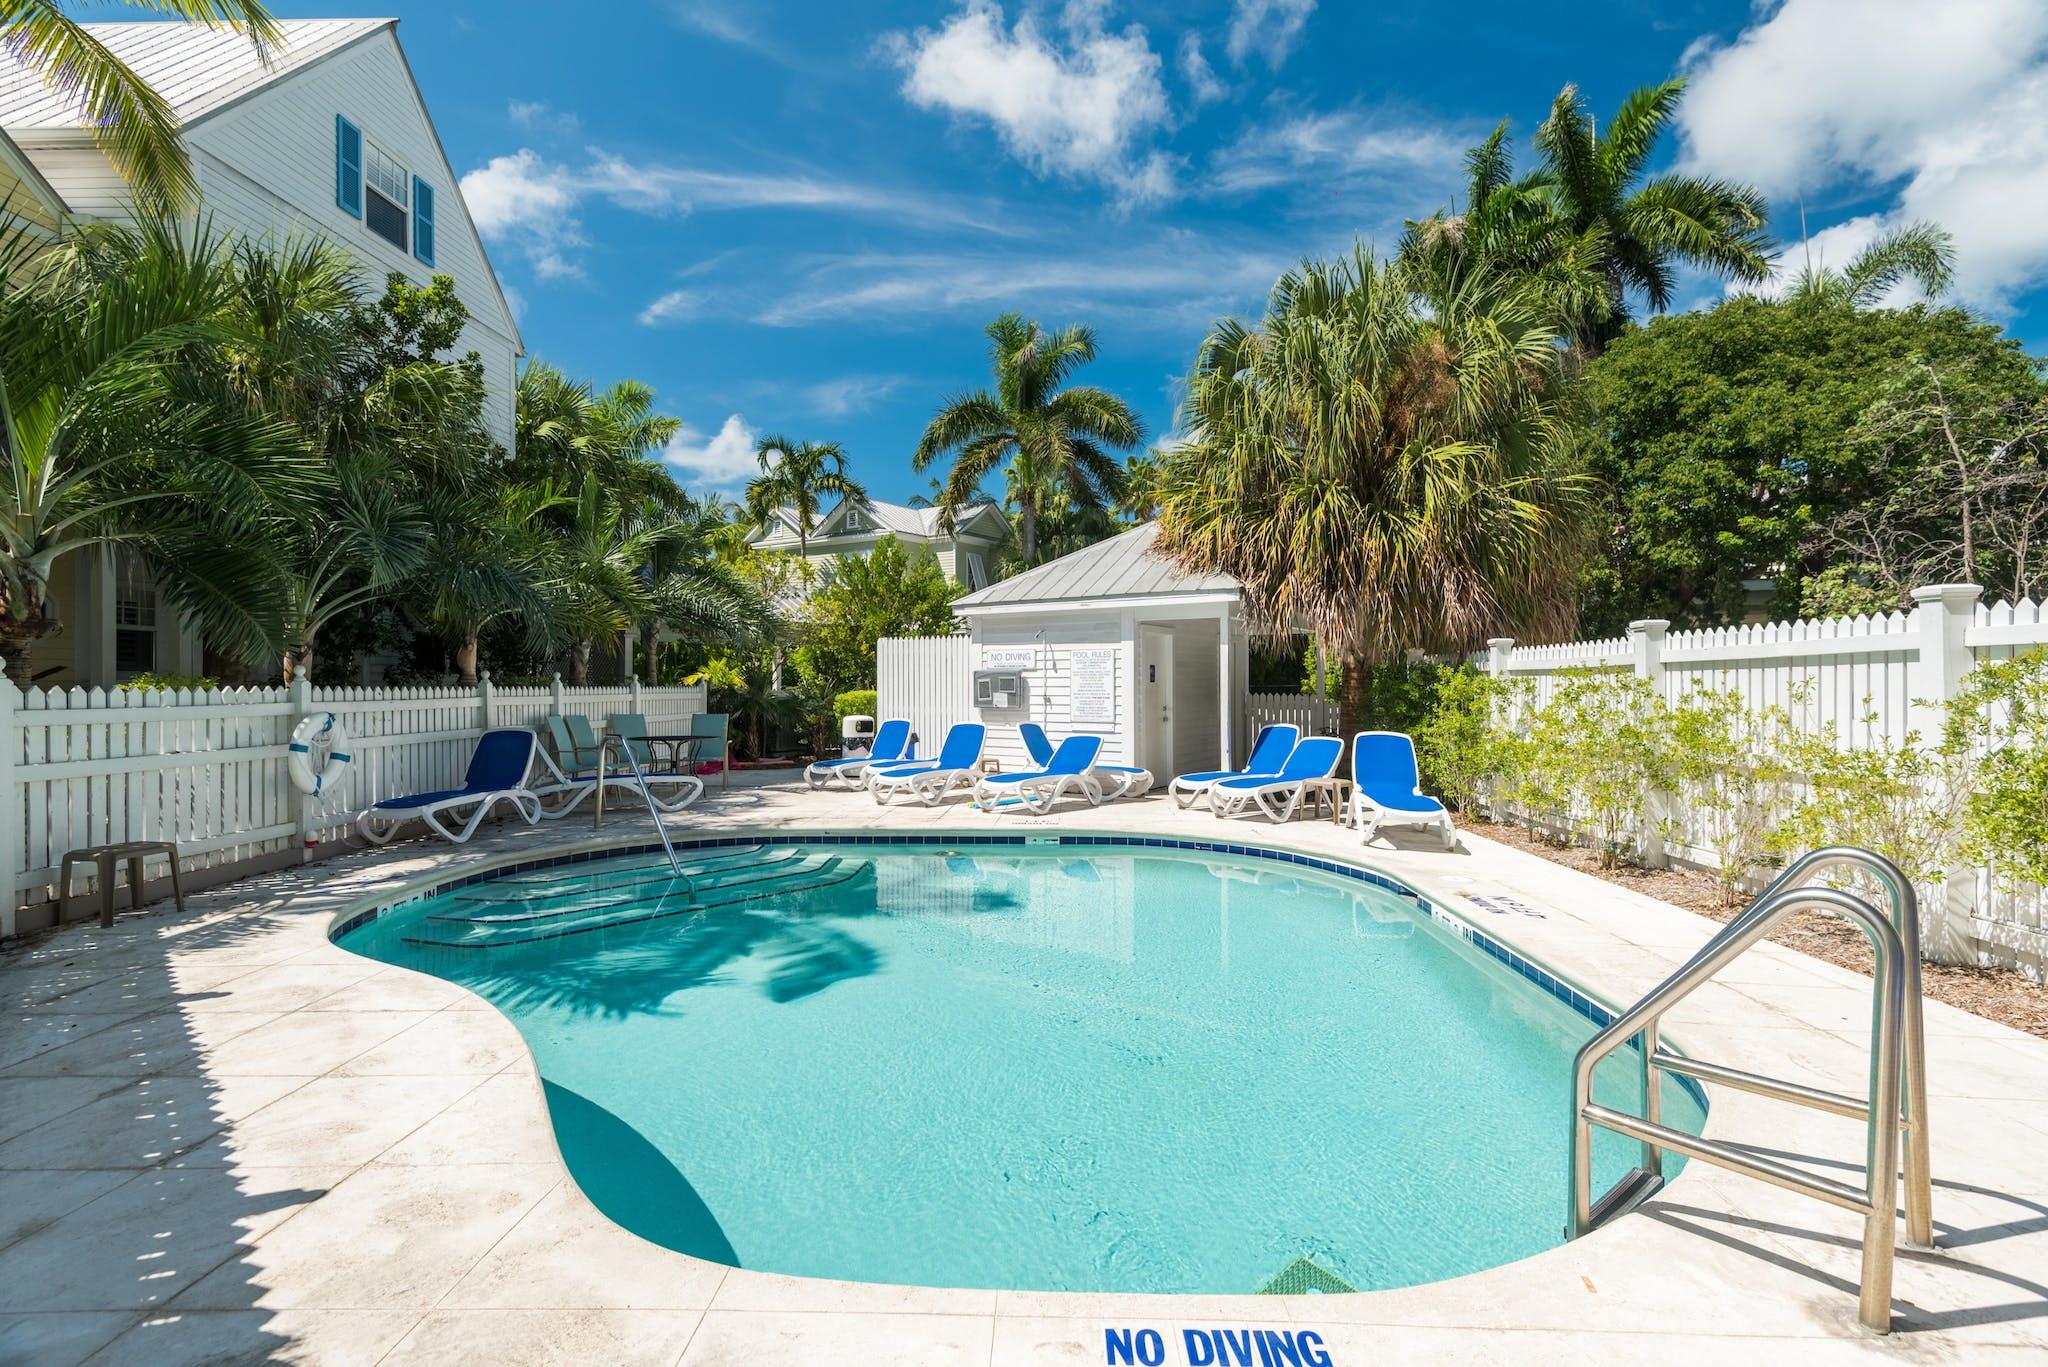 Groovy Rent Mangrove Lagoon Weekly Rental Key West Vacation Rental Interior Design Ideas Clesiryabchikinfo